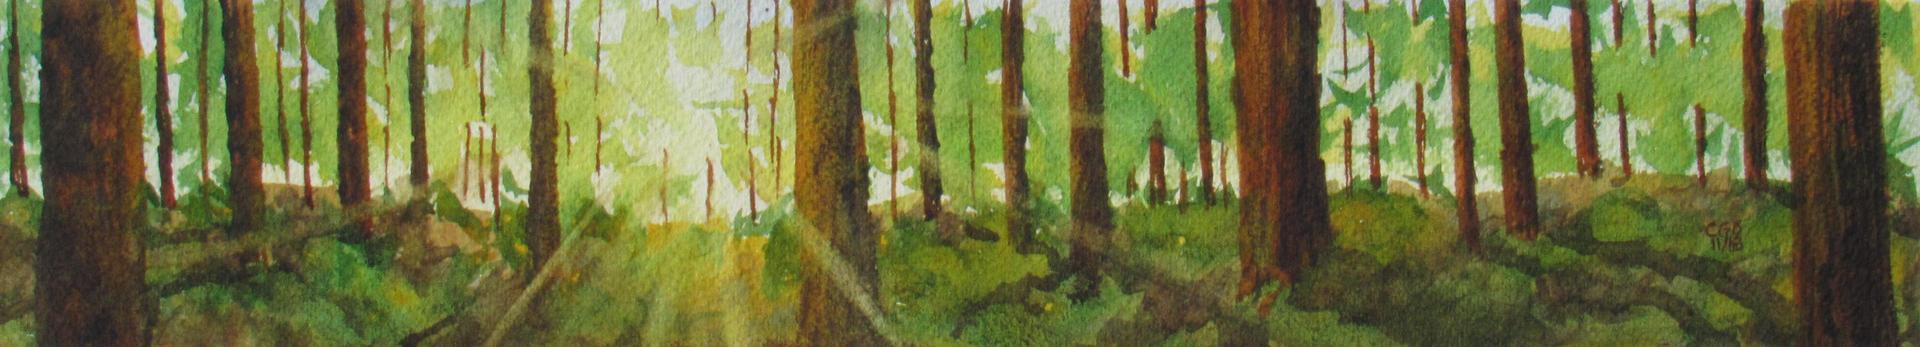 Sunlight through Redwoods